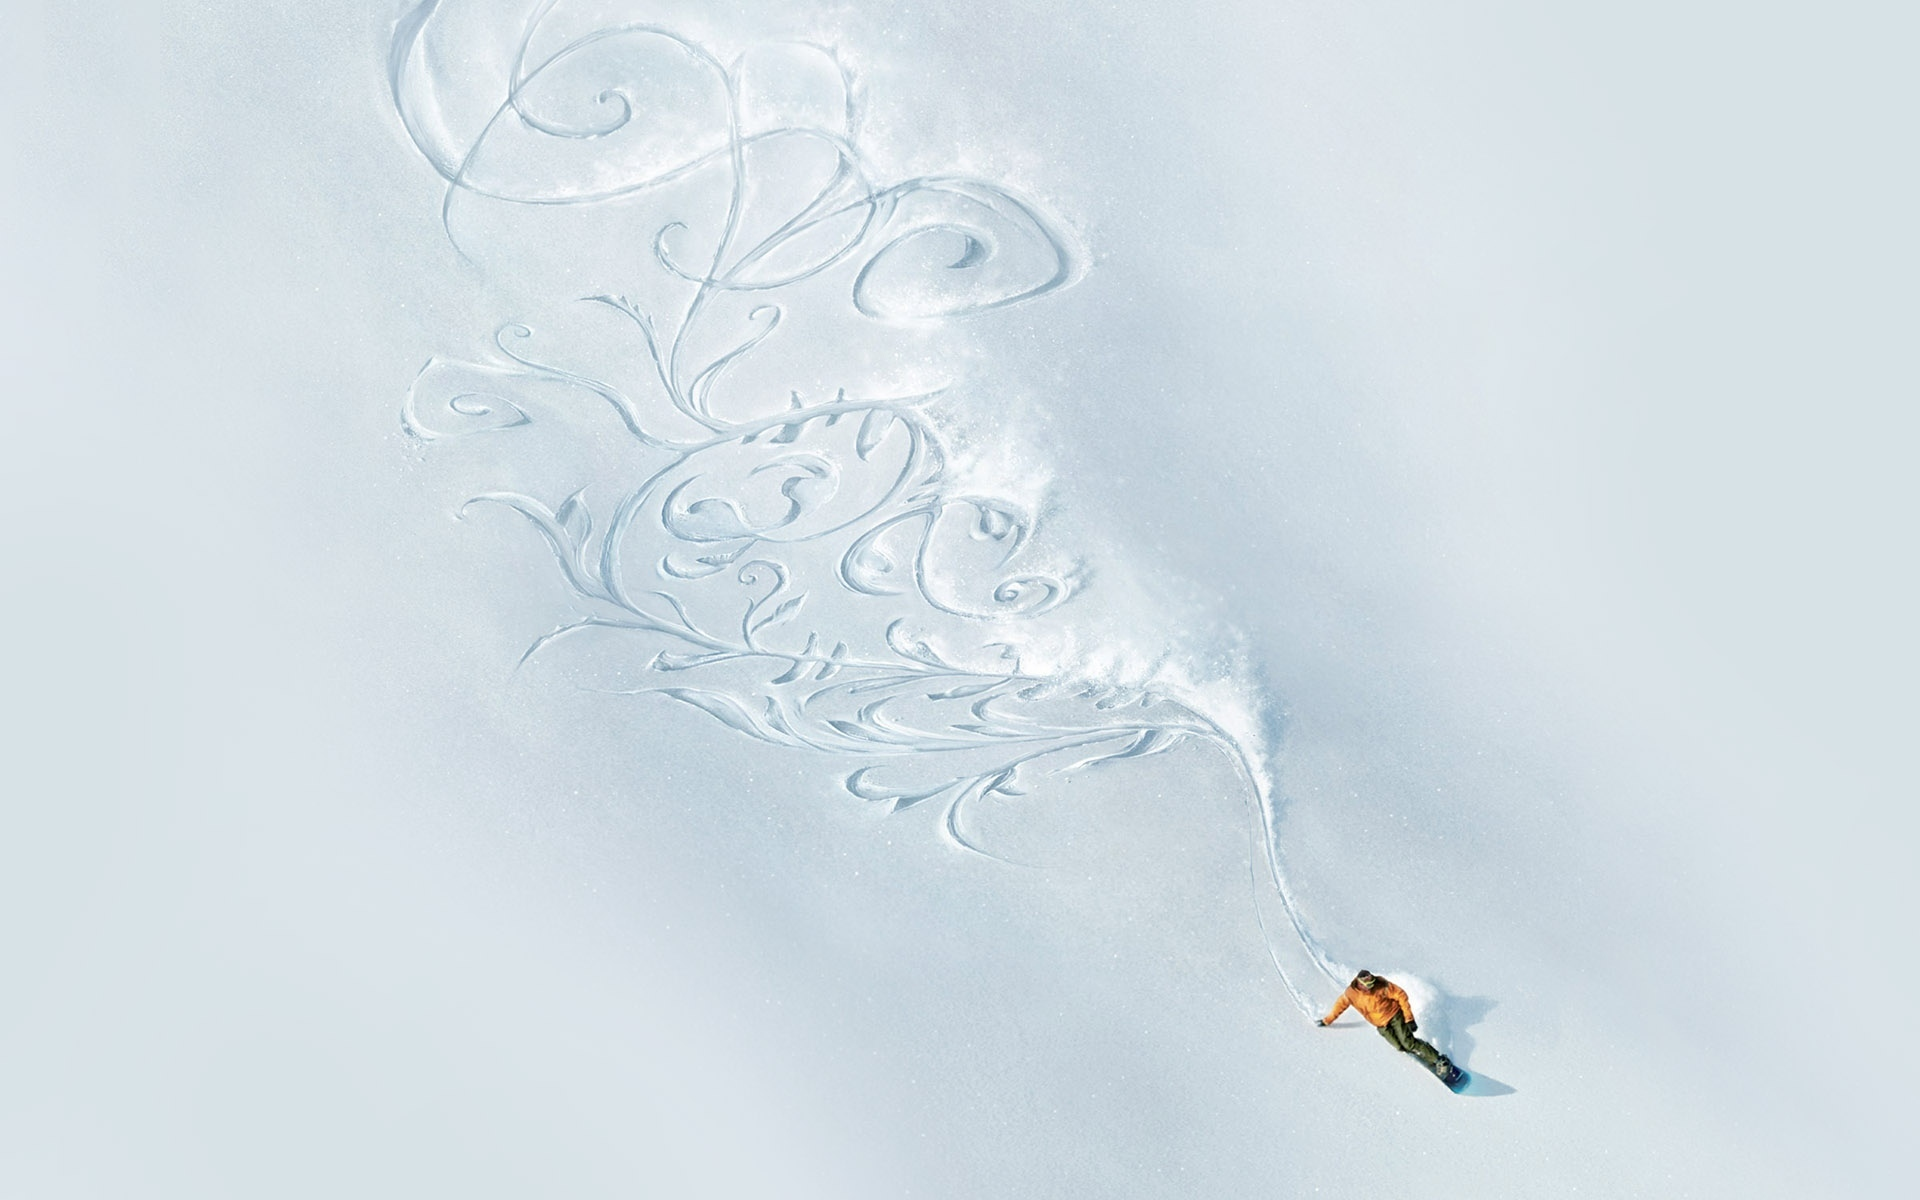 descente_neige-et-graphisme